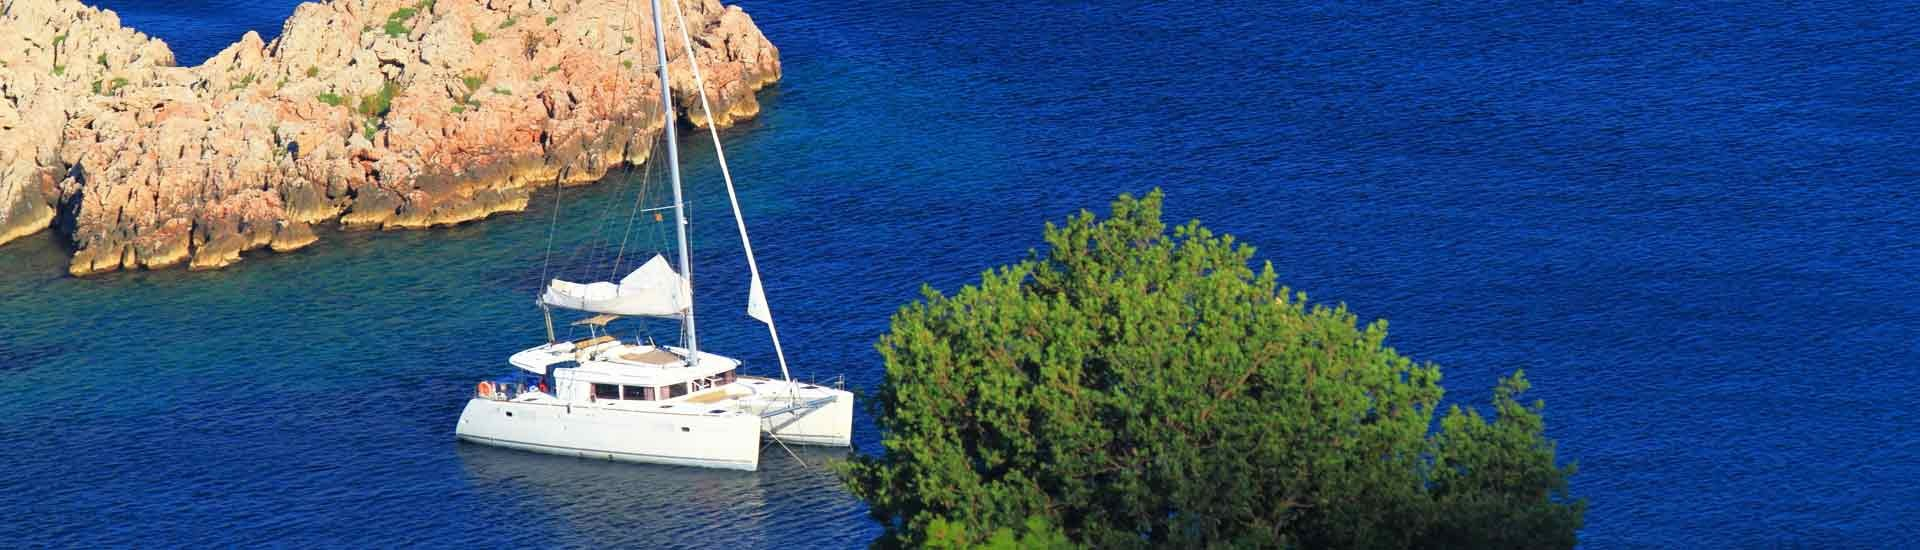 Catamaran Cove